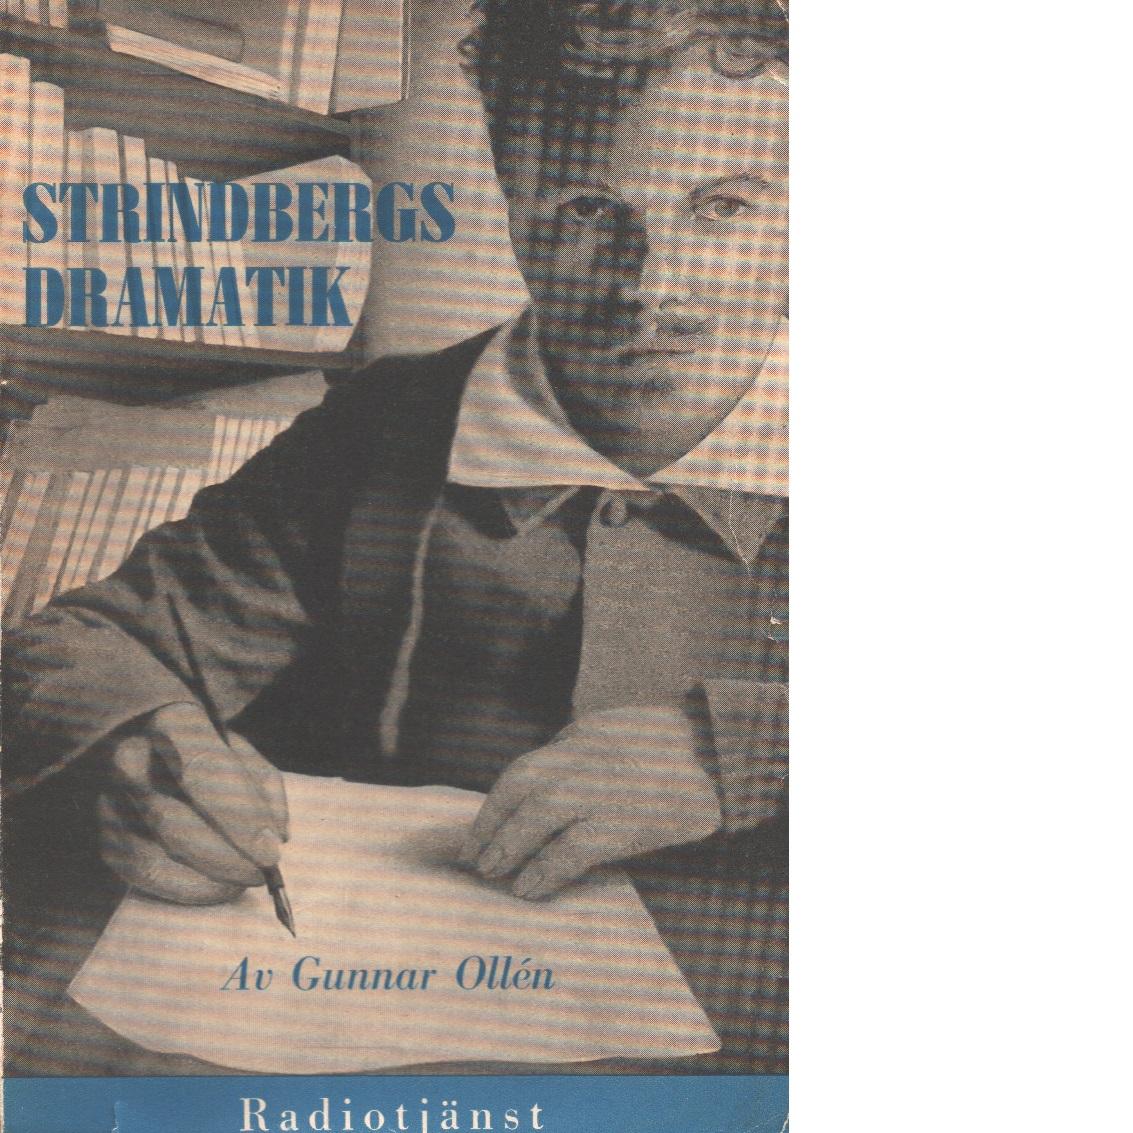 Strindbergs dramatik : en handbok - Ollén, Gunnar